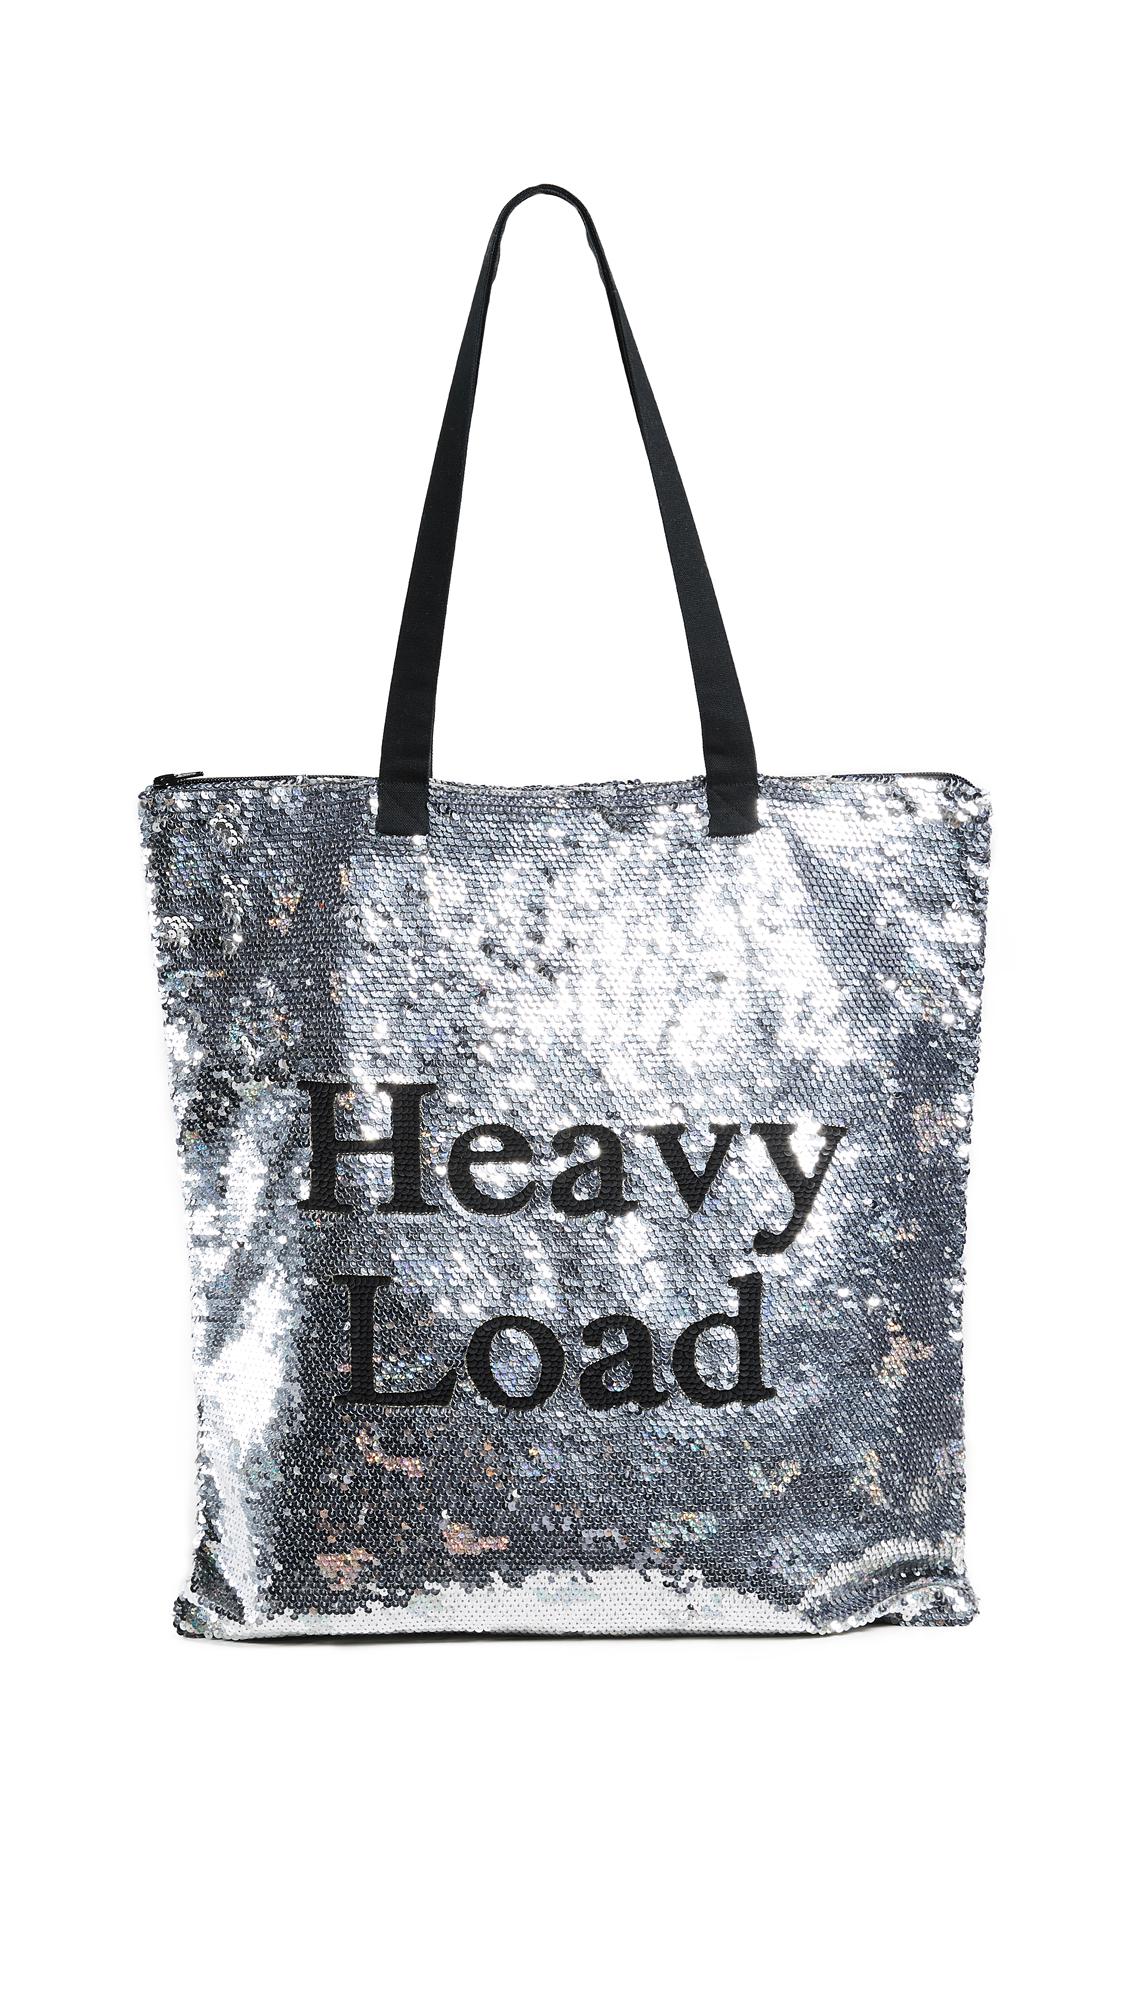 ASHISH Heavy Load Tote